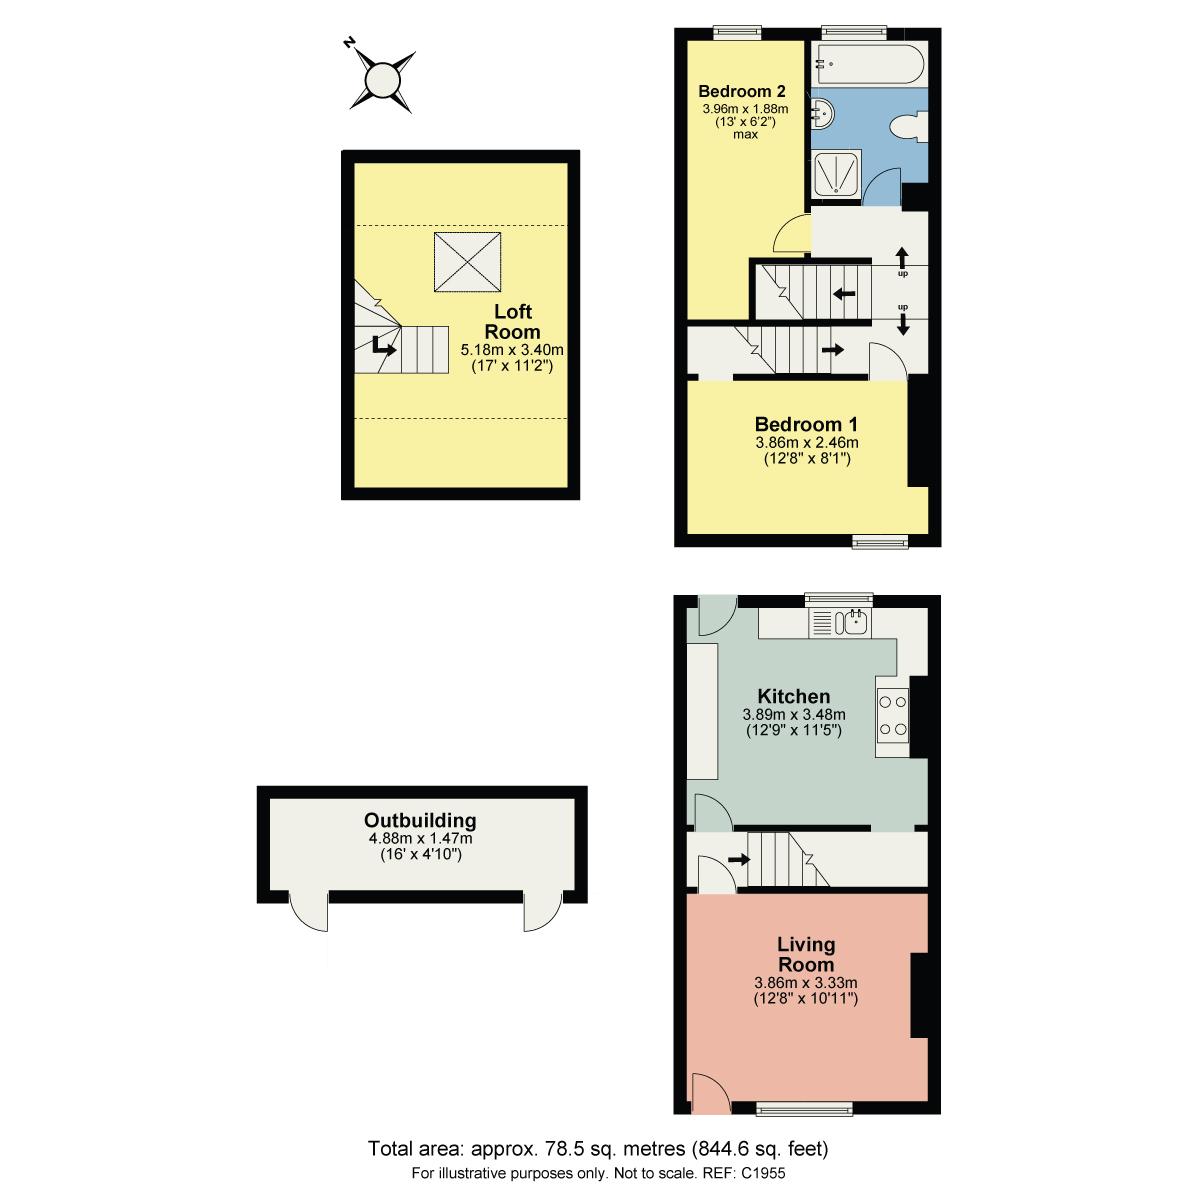 Floorplan Albert Street, Millhead, Carnforth, Lancashire, LA5 9DR